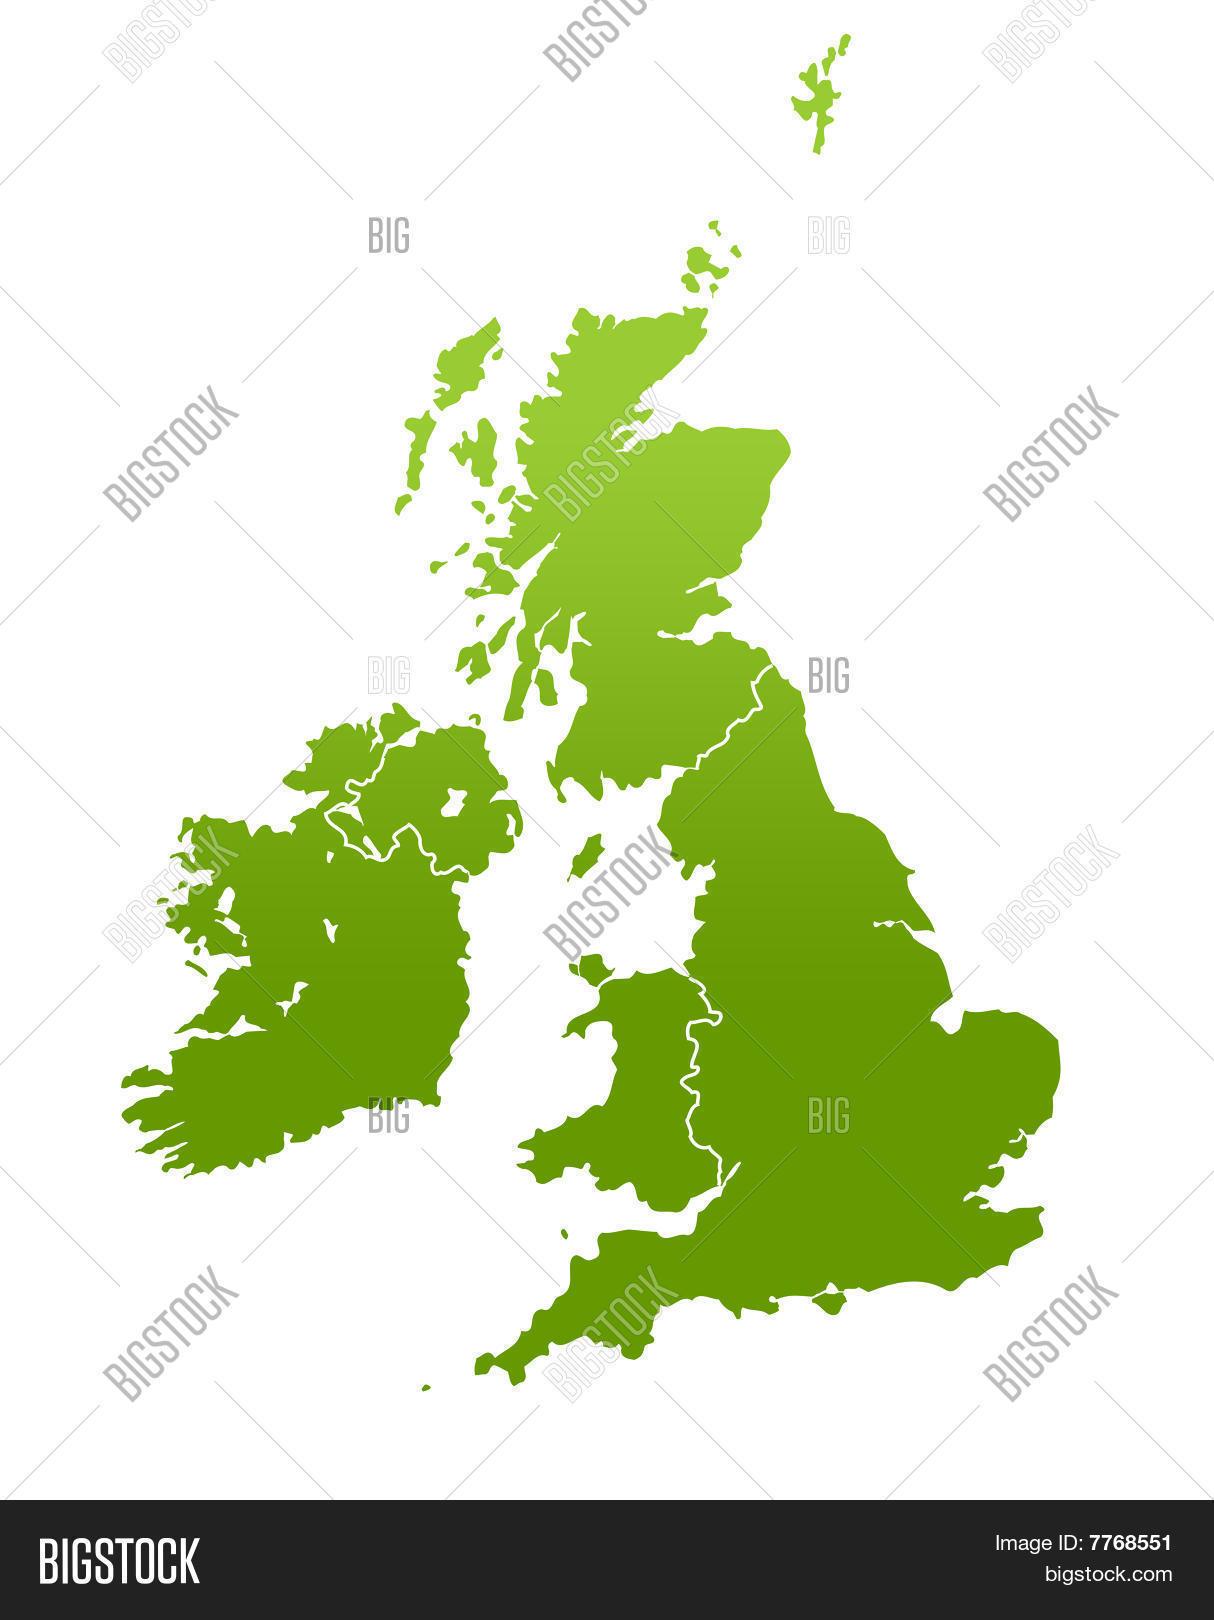 Uk Ireland Map Image & Photo (Free Trial) | Bigstock on netherlands map, thames river uk map, greece uk map, midlands uk map, ireland home, british isles uk map, the fens uk map, ireland seaside, st. helena uk map, ireland flag, edinburgh uk map, europe uk map, belfast uk map, gibraltar uk map, north west uk map, guernsey uk map, south east uk map, jersey uk map, uk tourist map, oman uk map,